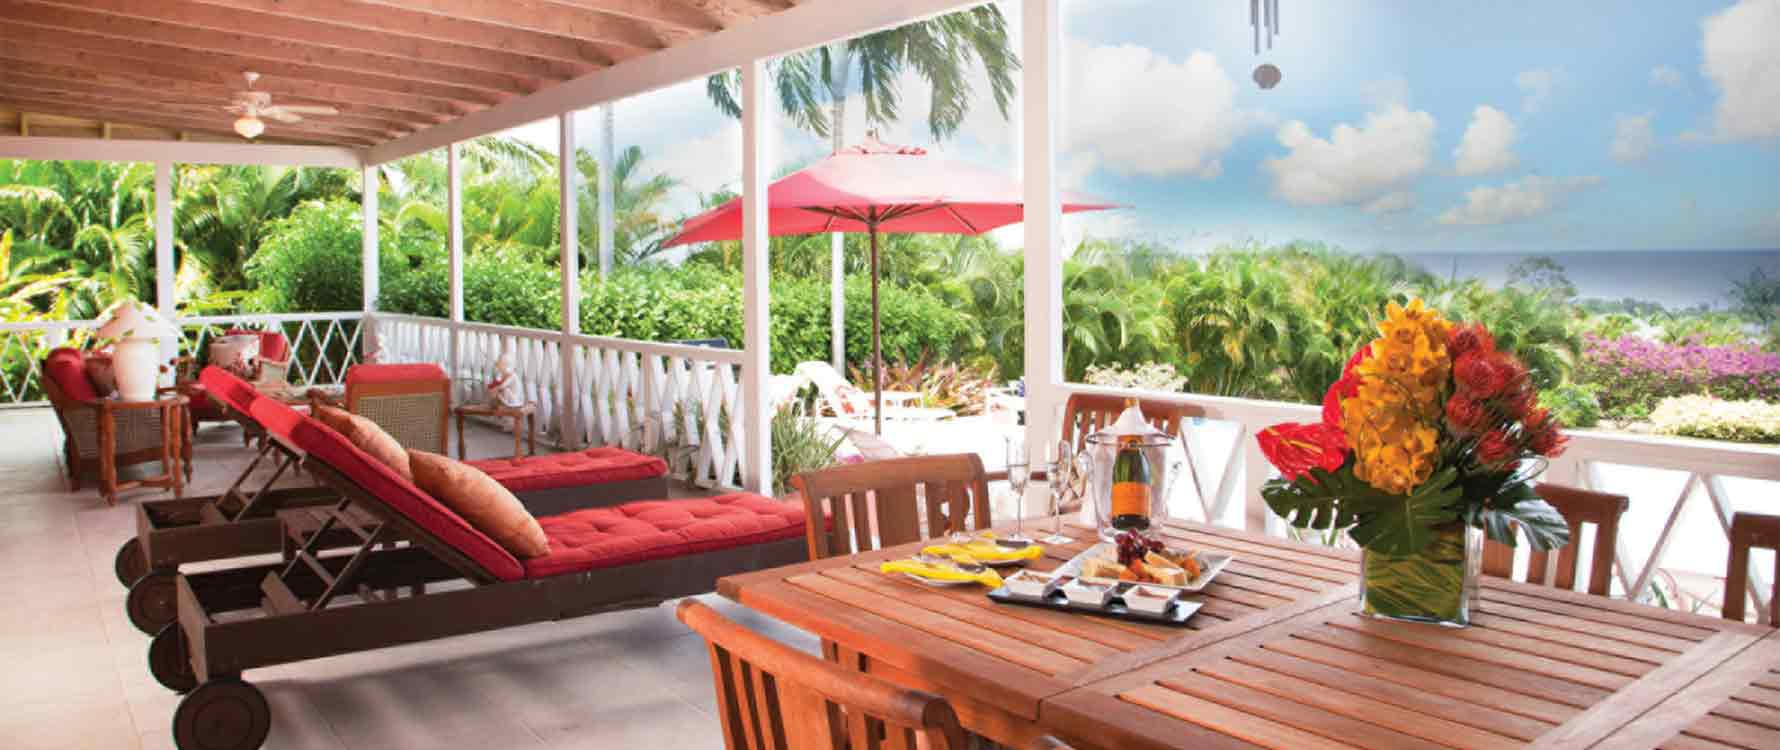 Back veranda dining area.